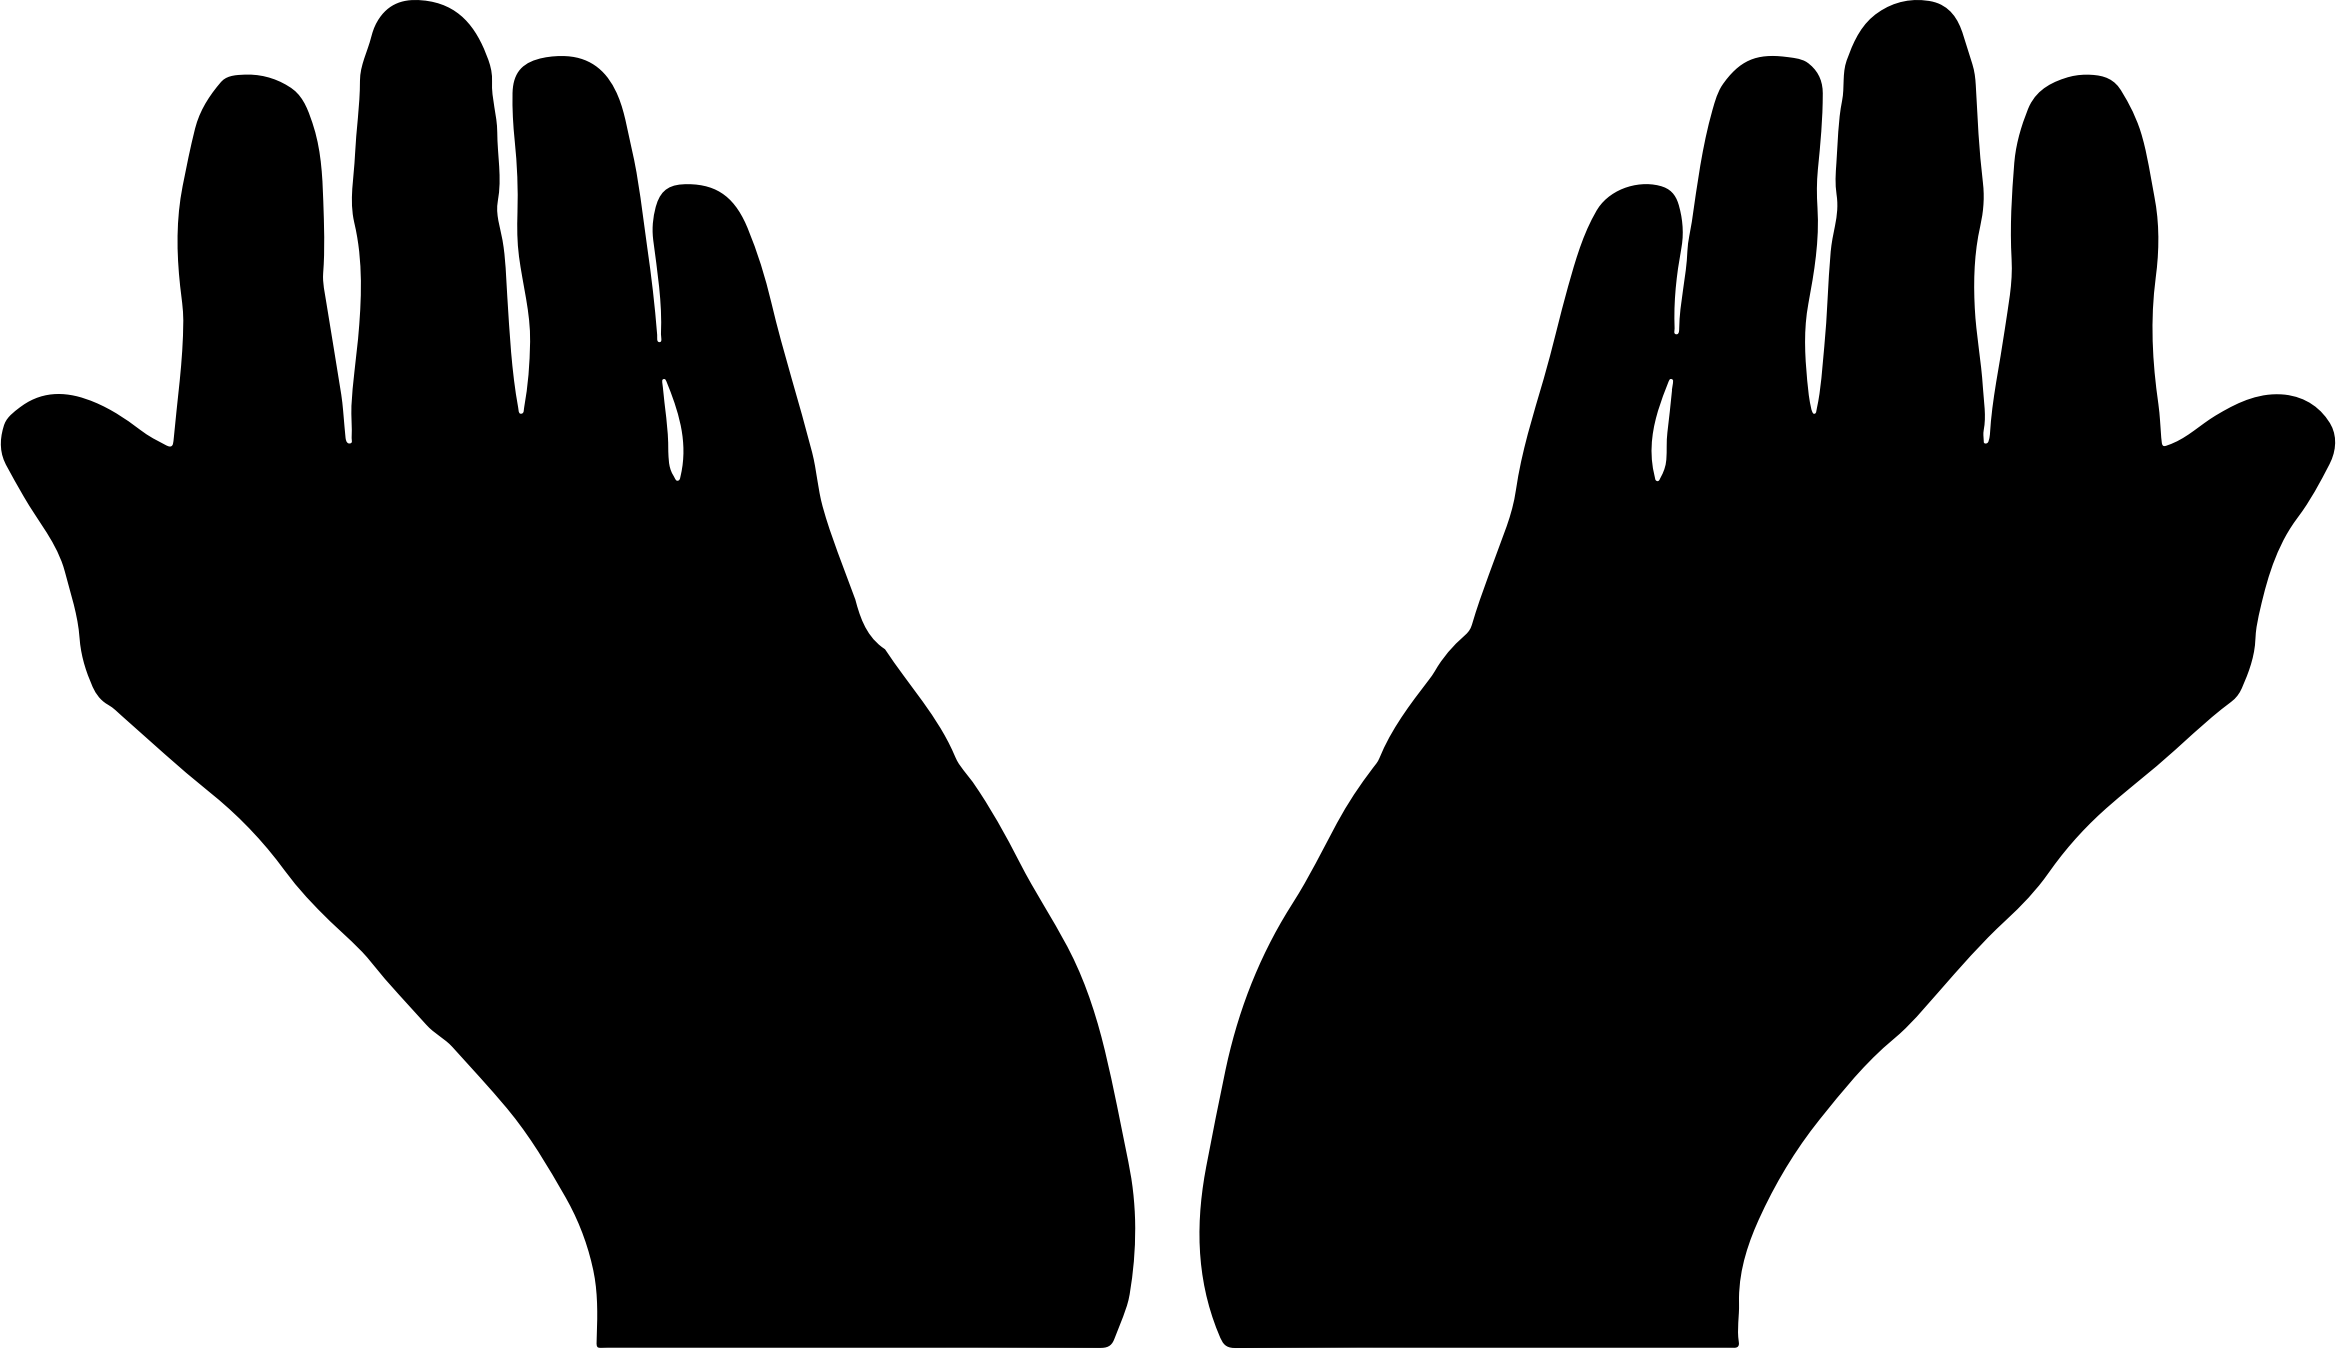 2336x1349 Clipart